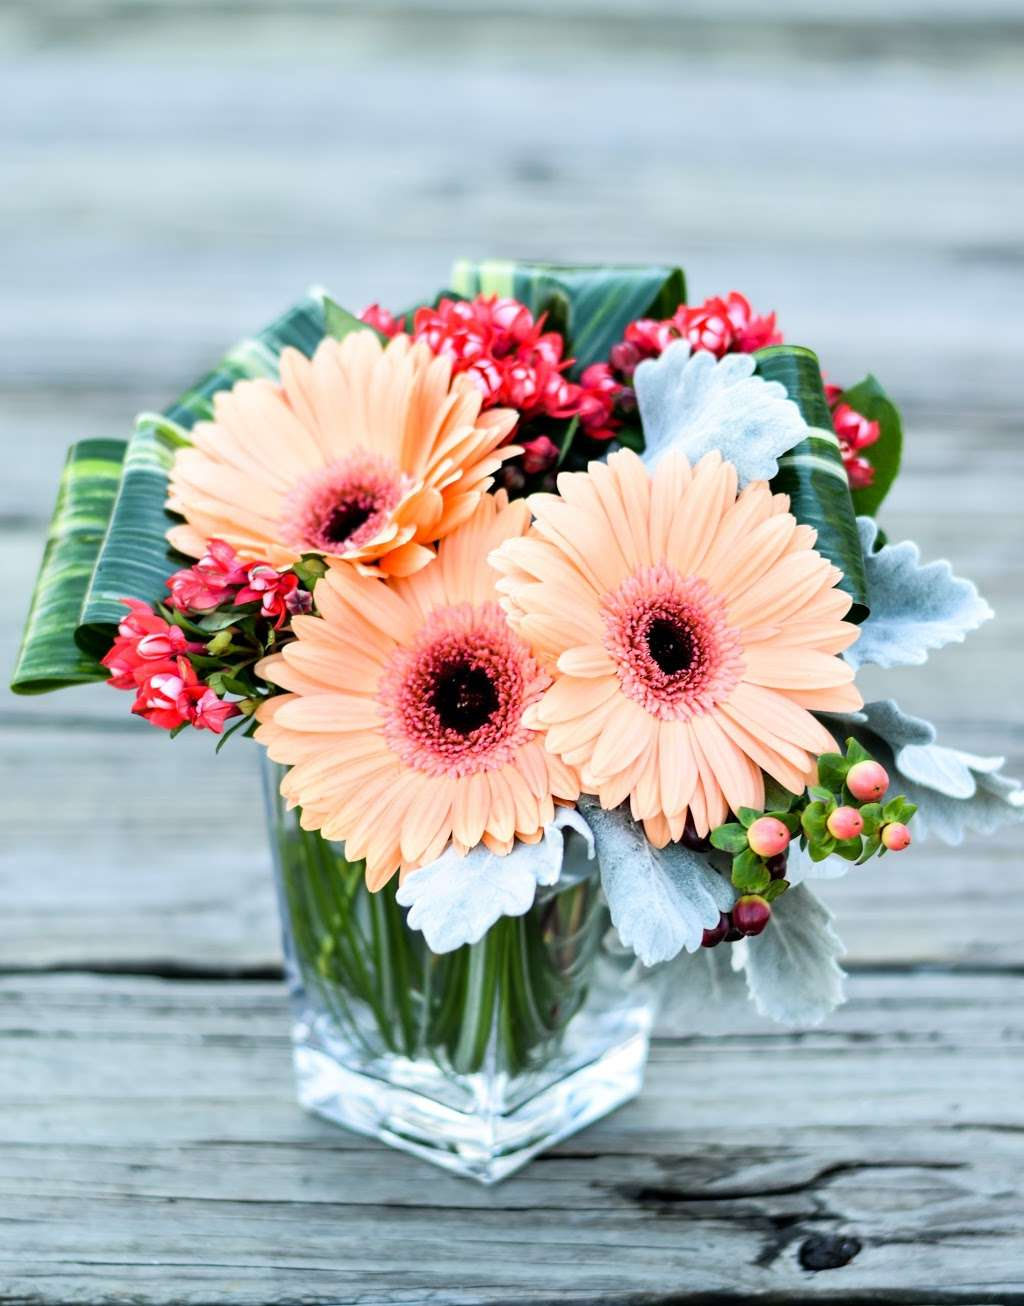 Noahs Ark Florist - florist  | Photo 10 of 10 | Address: 200 Hudson Street Harborside Financial Center, Jersey City, NJ 07311, USA | Phone: (201) 521-1031